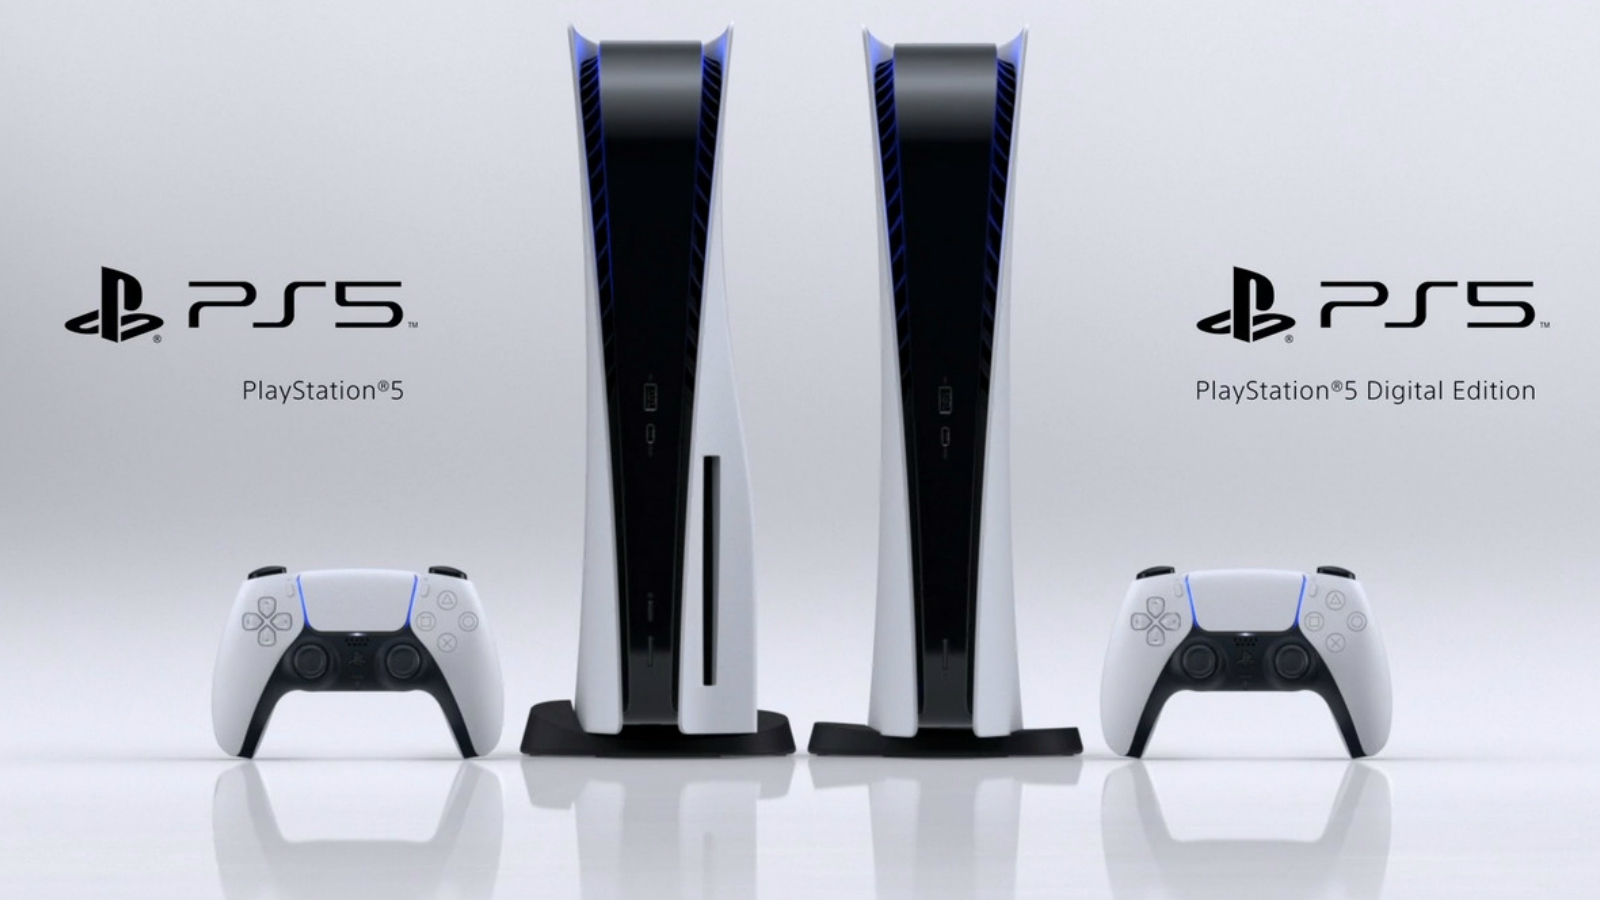 PlayStation 5 models side by side.